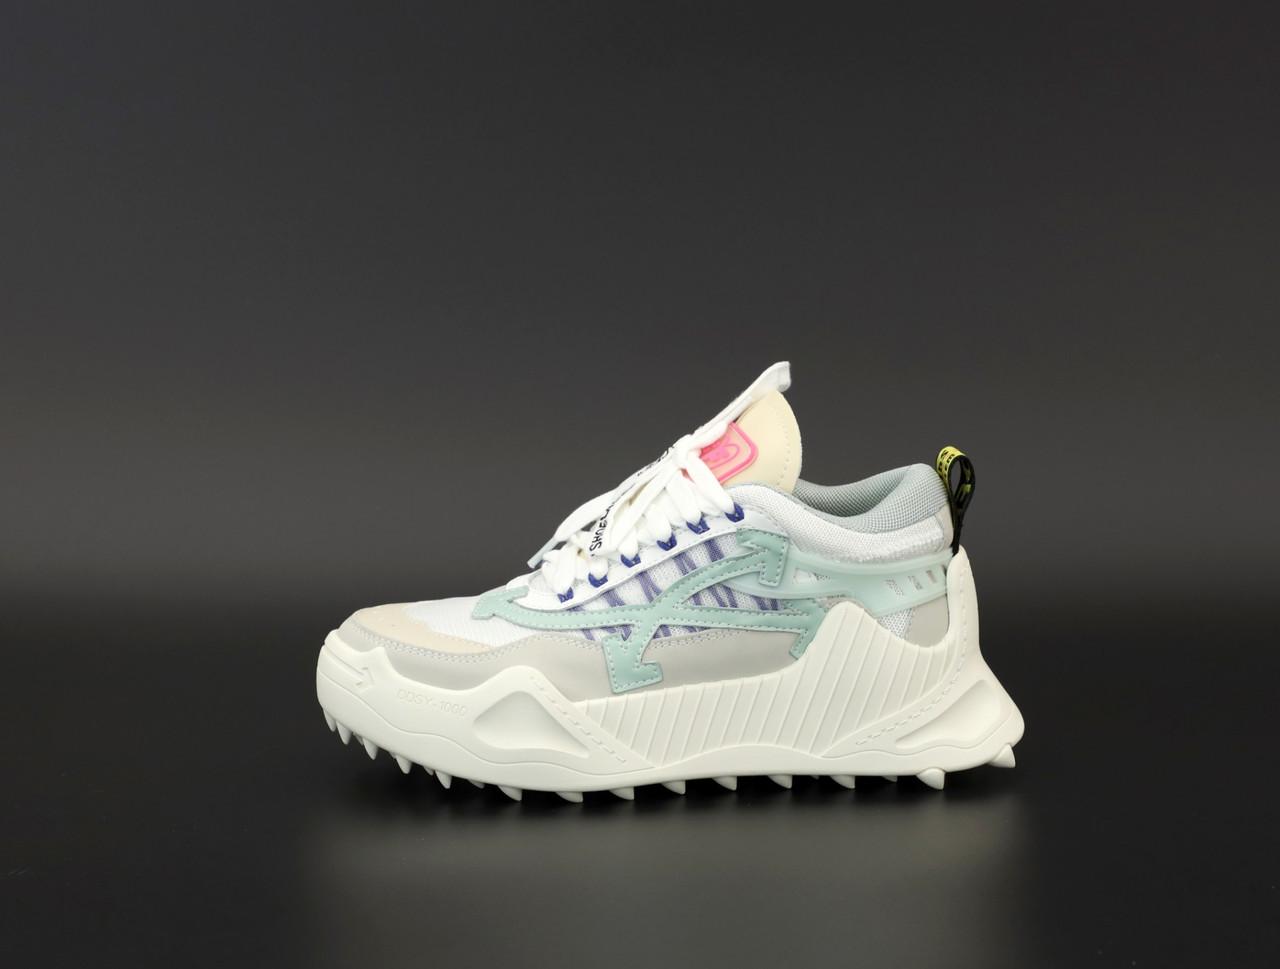 Женские кроссовки Off-White ODSY-1000, женские кроссовки офф вайт одси 1000, кросівки Off-White ODSY-1000